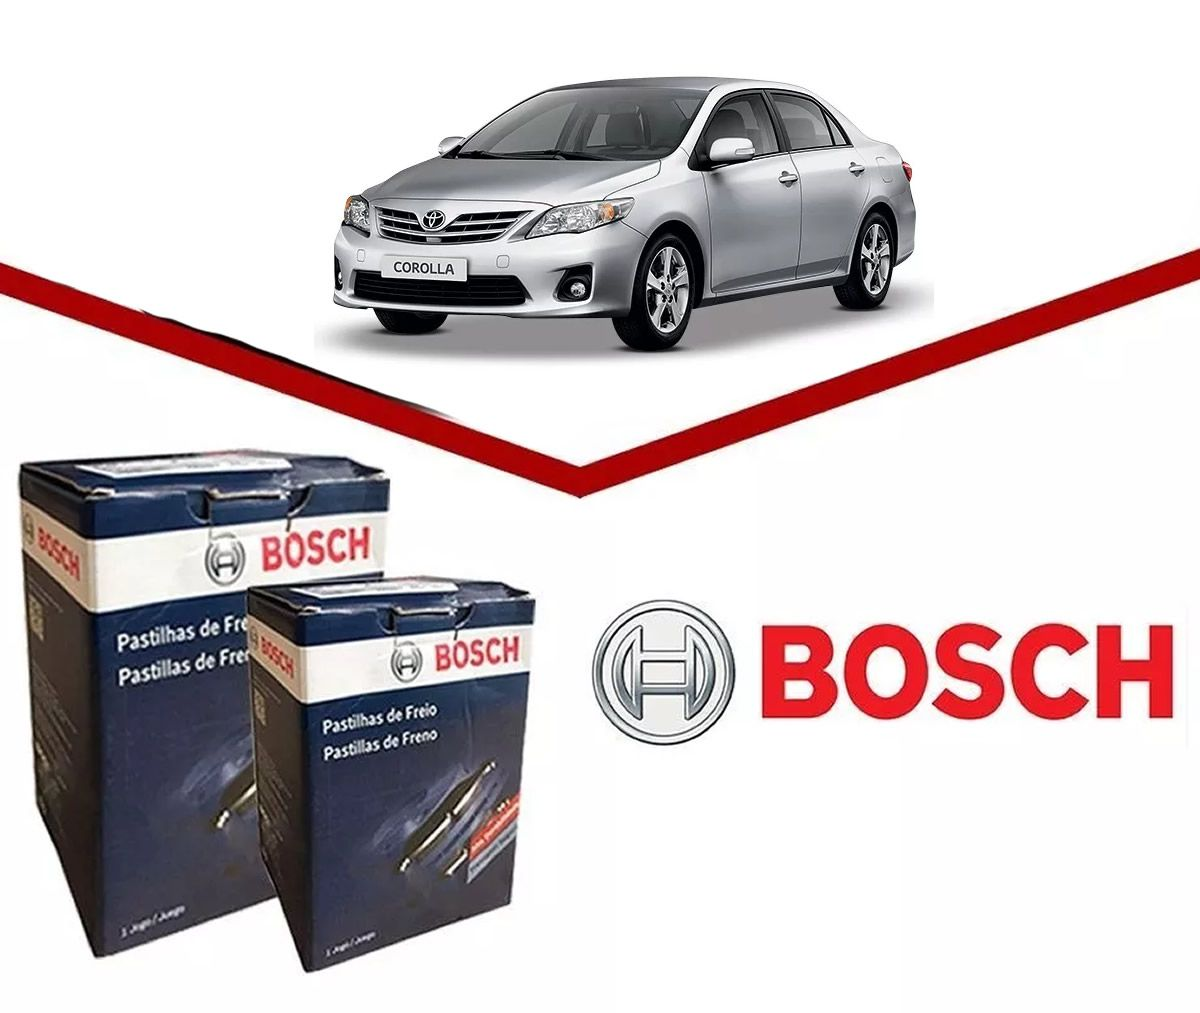 Kit Pastilhas Freio Dianteiro + Traseiro Corolla 2009 2010 2011 2012 2013 2014 Original Bosch  - Unicar